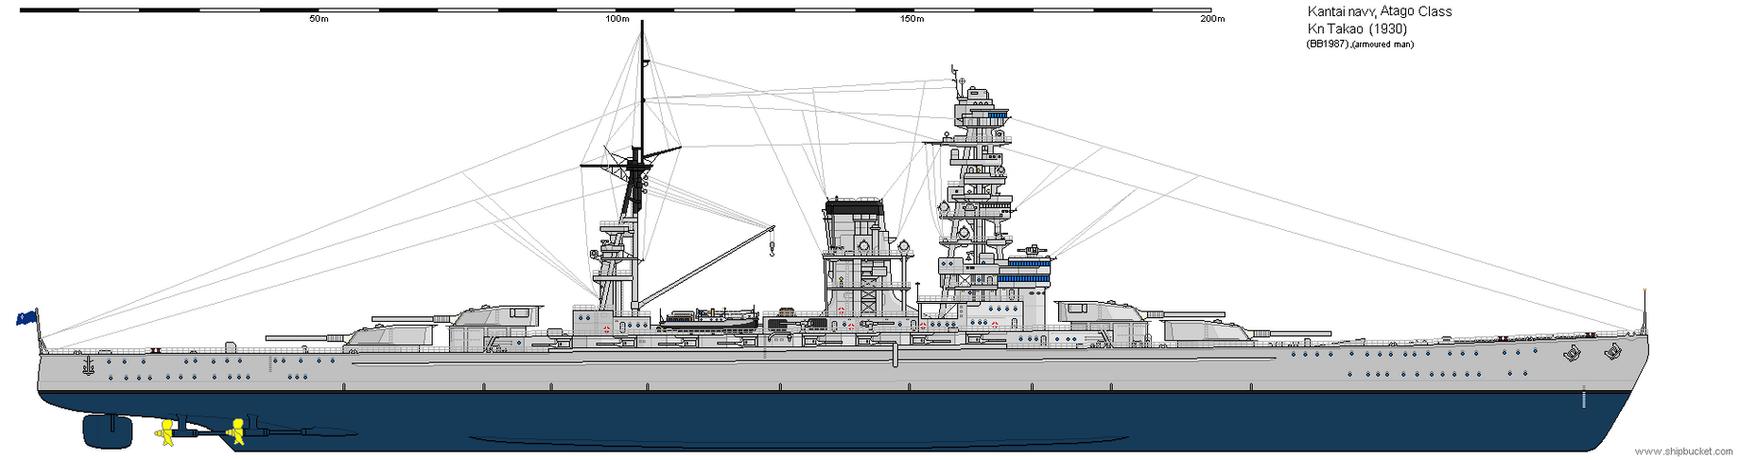 Atago class battleship (1930) by space-joe